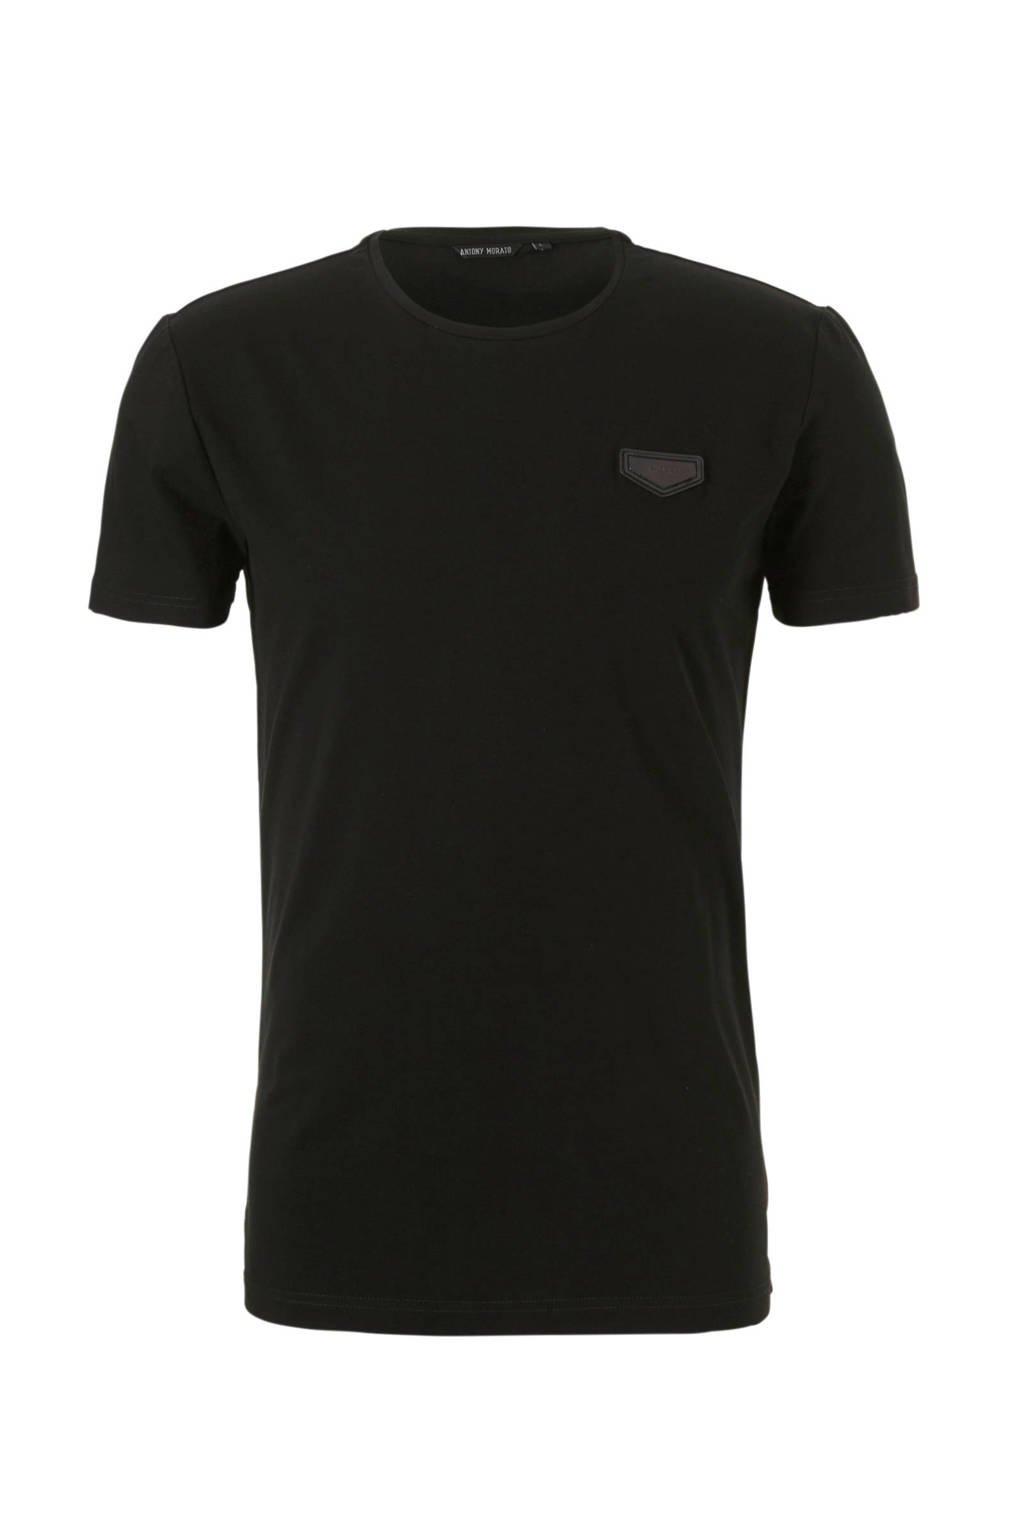 Antony Morato T-shirt, Zwart